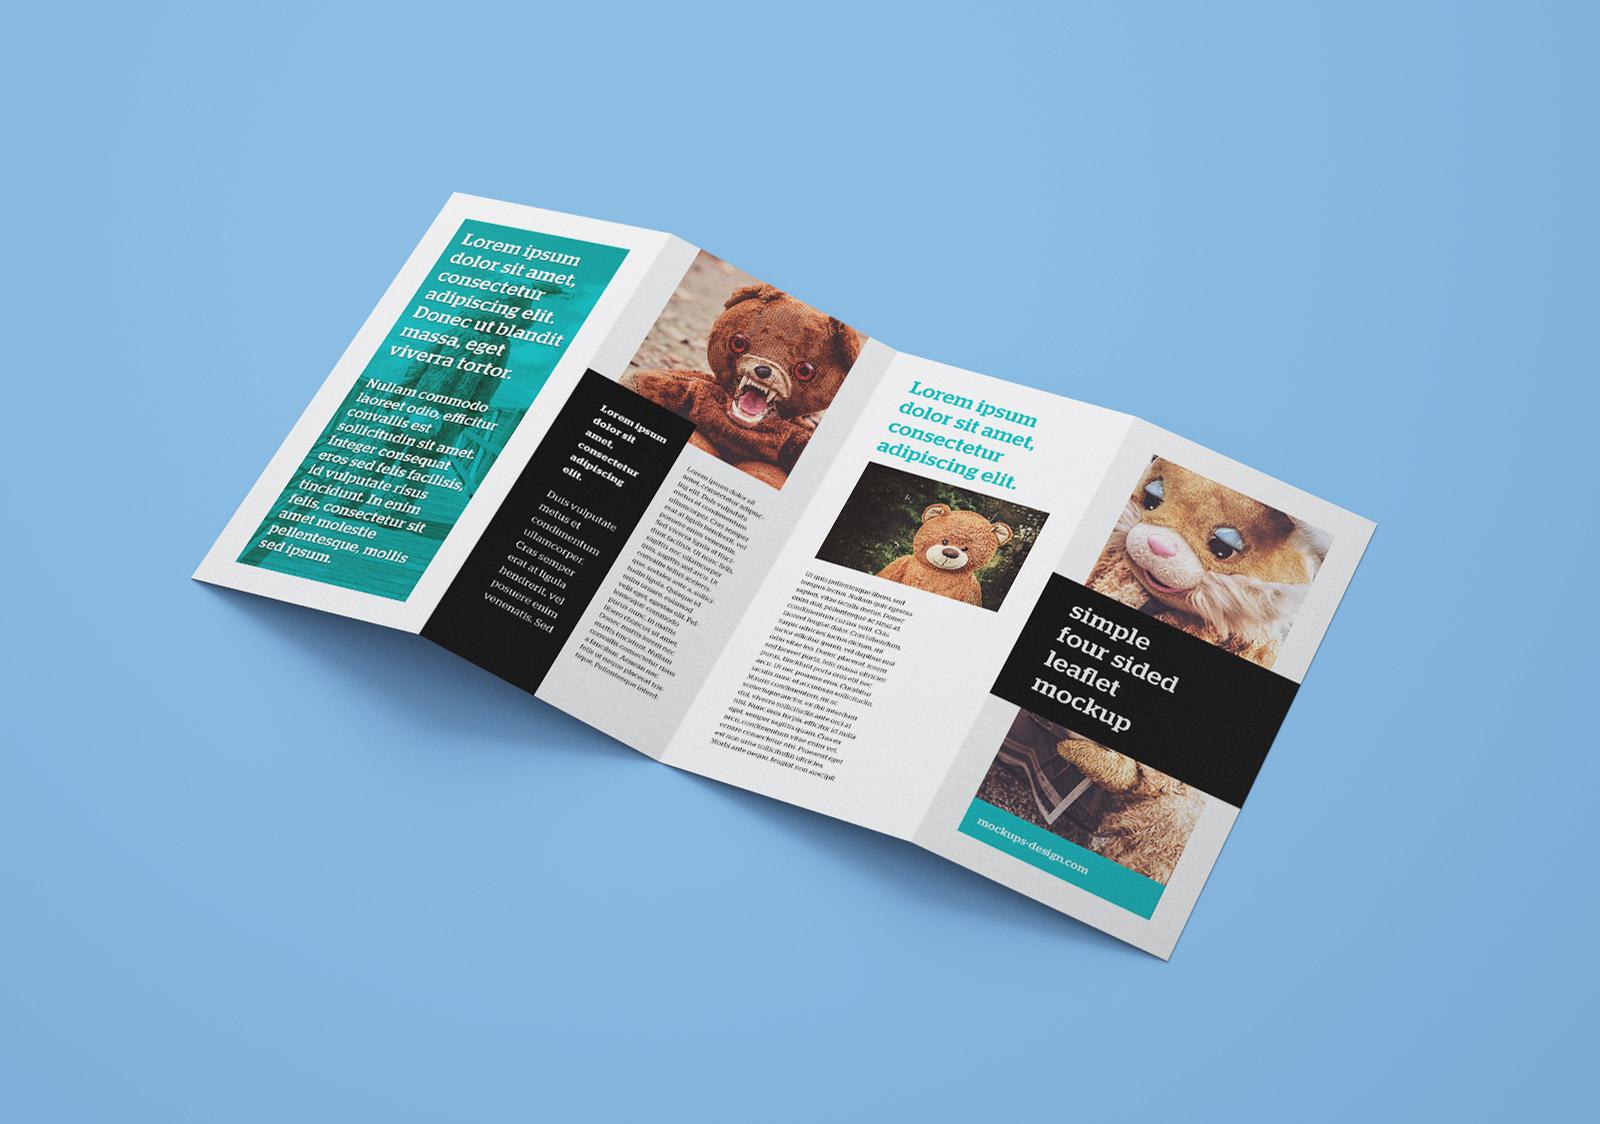 Free Accordion 4-Fold Brochure Leaflet Mockup PSD Templates (3)